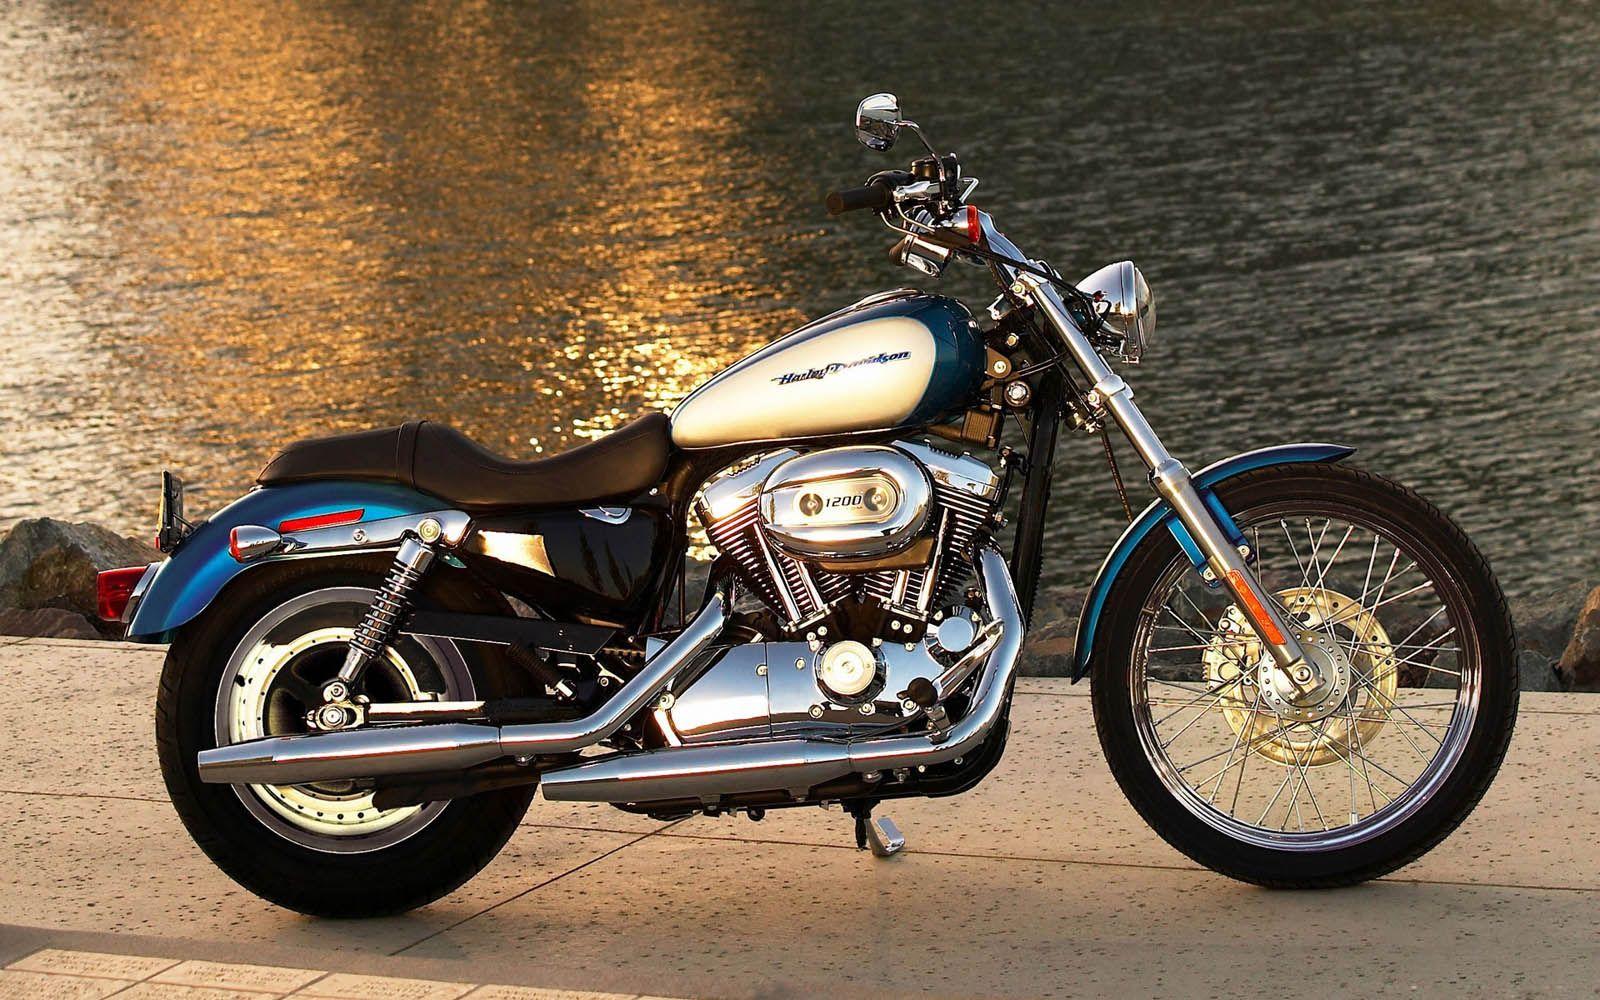 Harley Davidson Chopper Bike Http Www Stosum Com Stosum